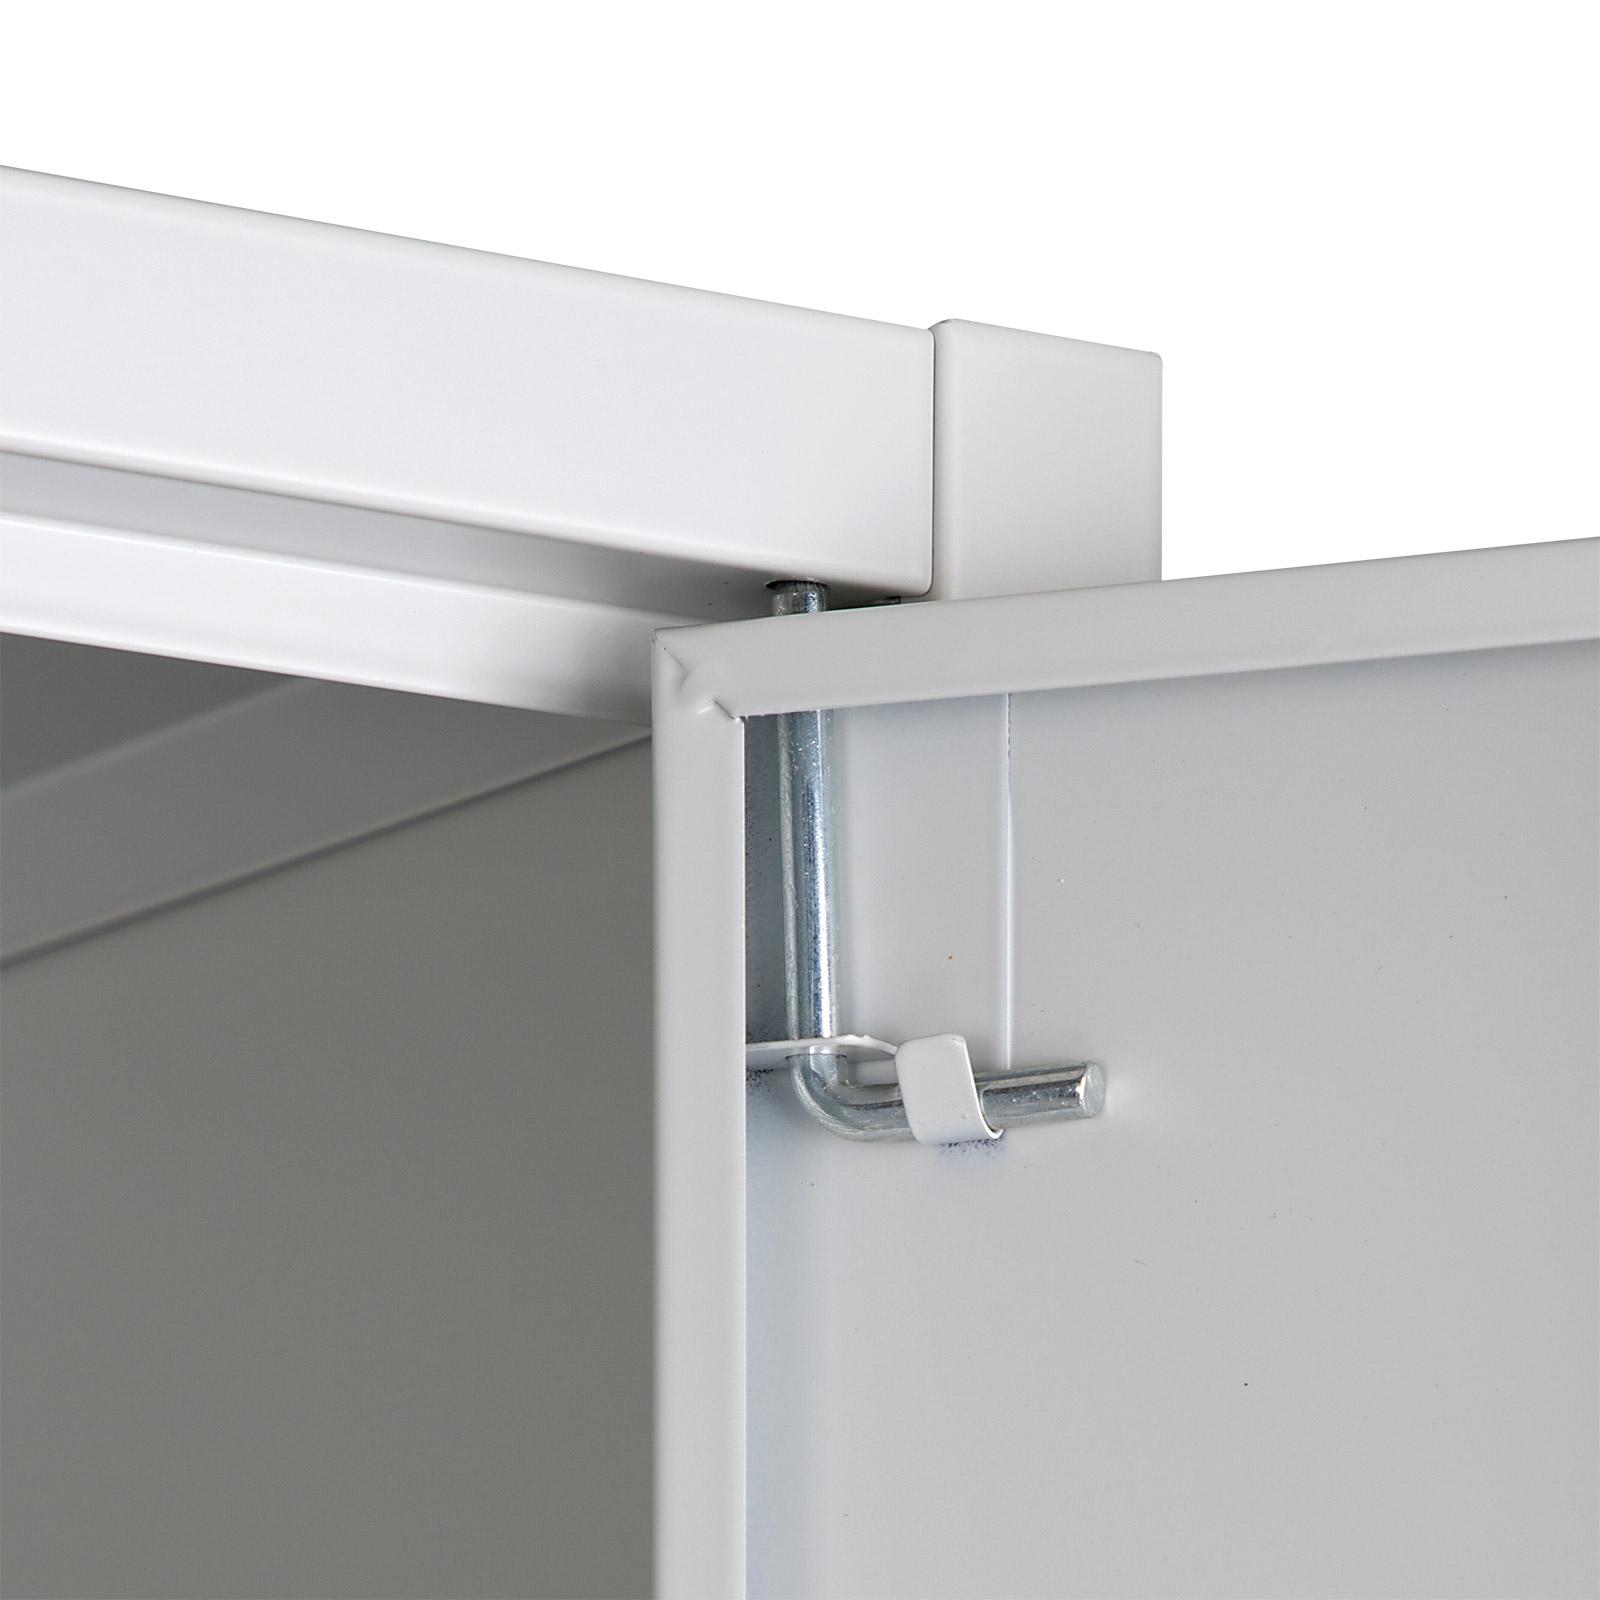 917341 Metall Schrank Werkzeug Akten Büro Hobbyschrank 40553 | eBay